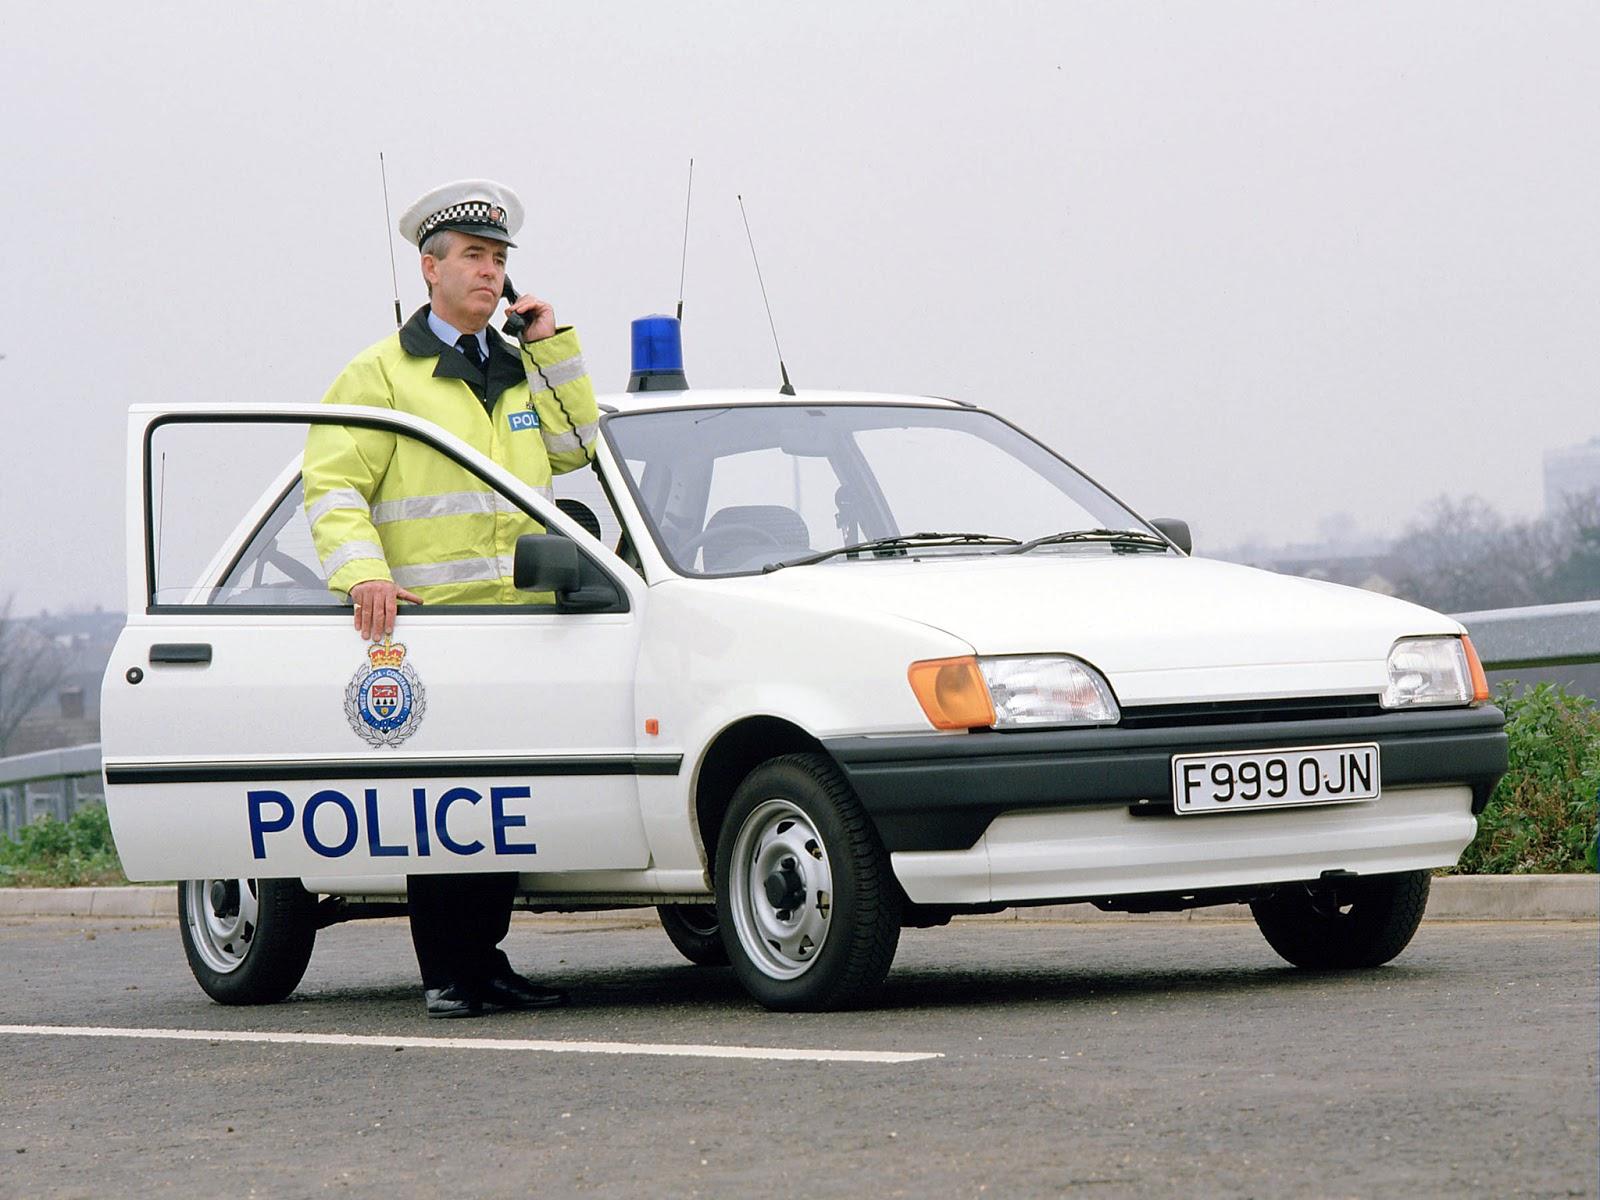 FordFiesta 1989 1995 fiesta 3 door police 01 1 Έκανες Πολύ Δρόμο Μωρό μου! - Το Ford Fiesta Γίνεται 40 Ετών Ford, Ford Fiesta, Fun, videos, zblog